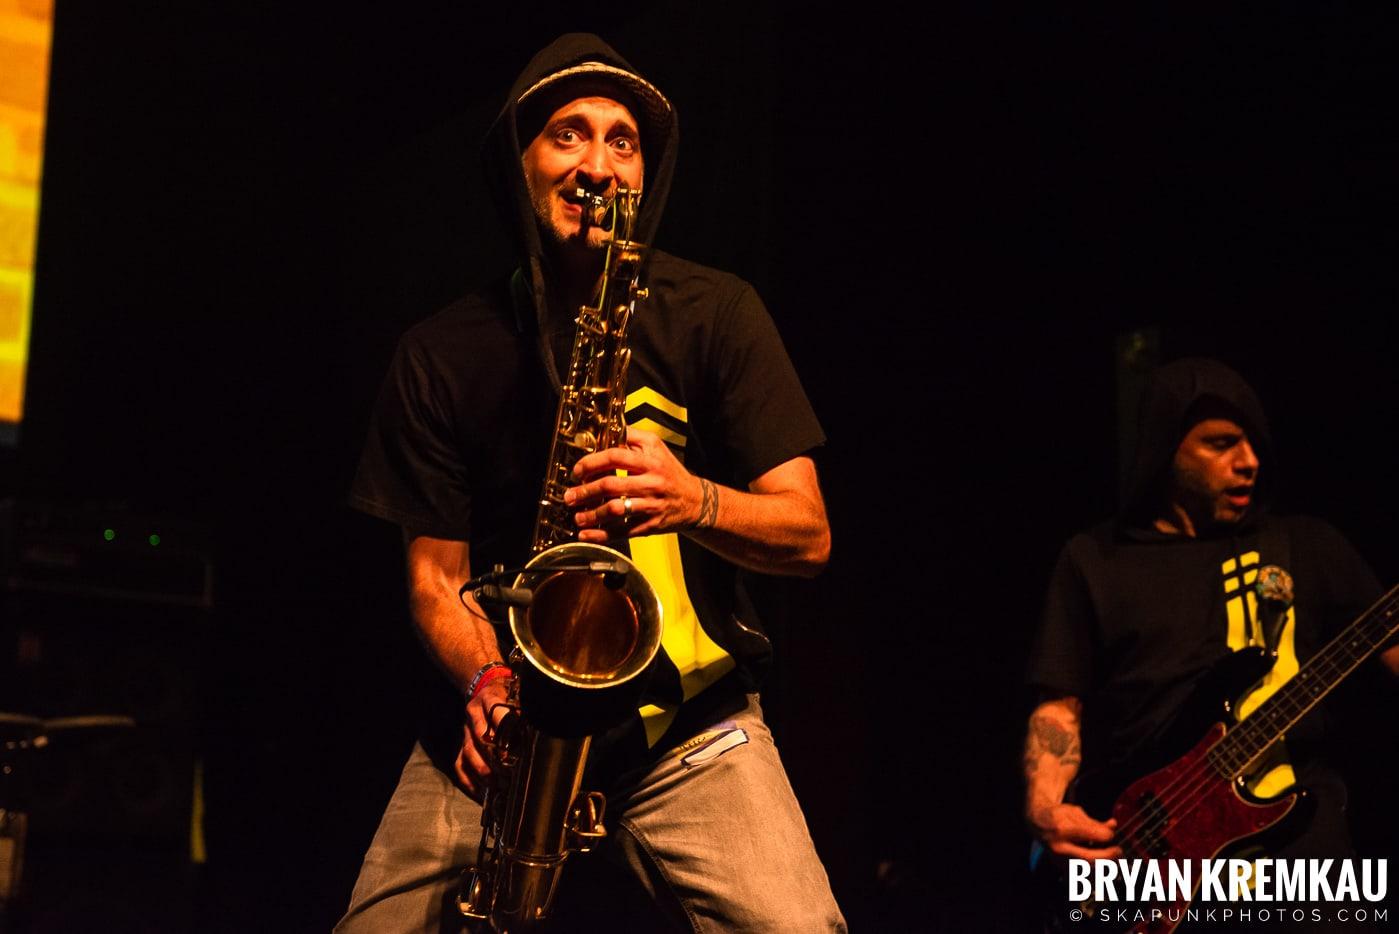 Sgt. Scagnetti @ Radicsfest, Gramercy Theatre, NYC - 7.19.19 (43)